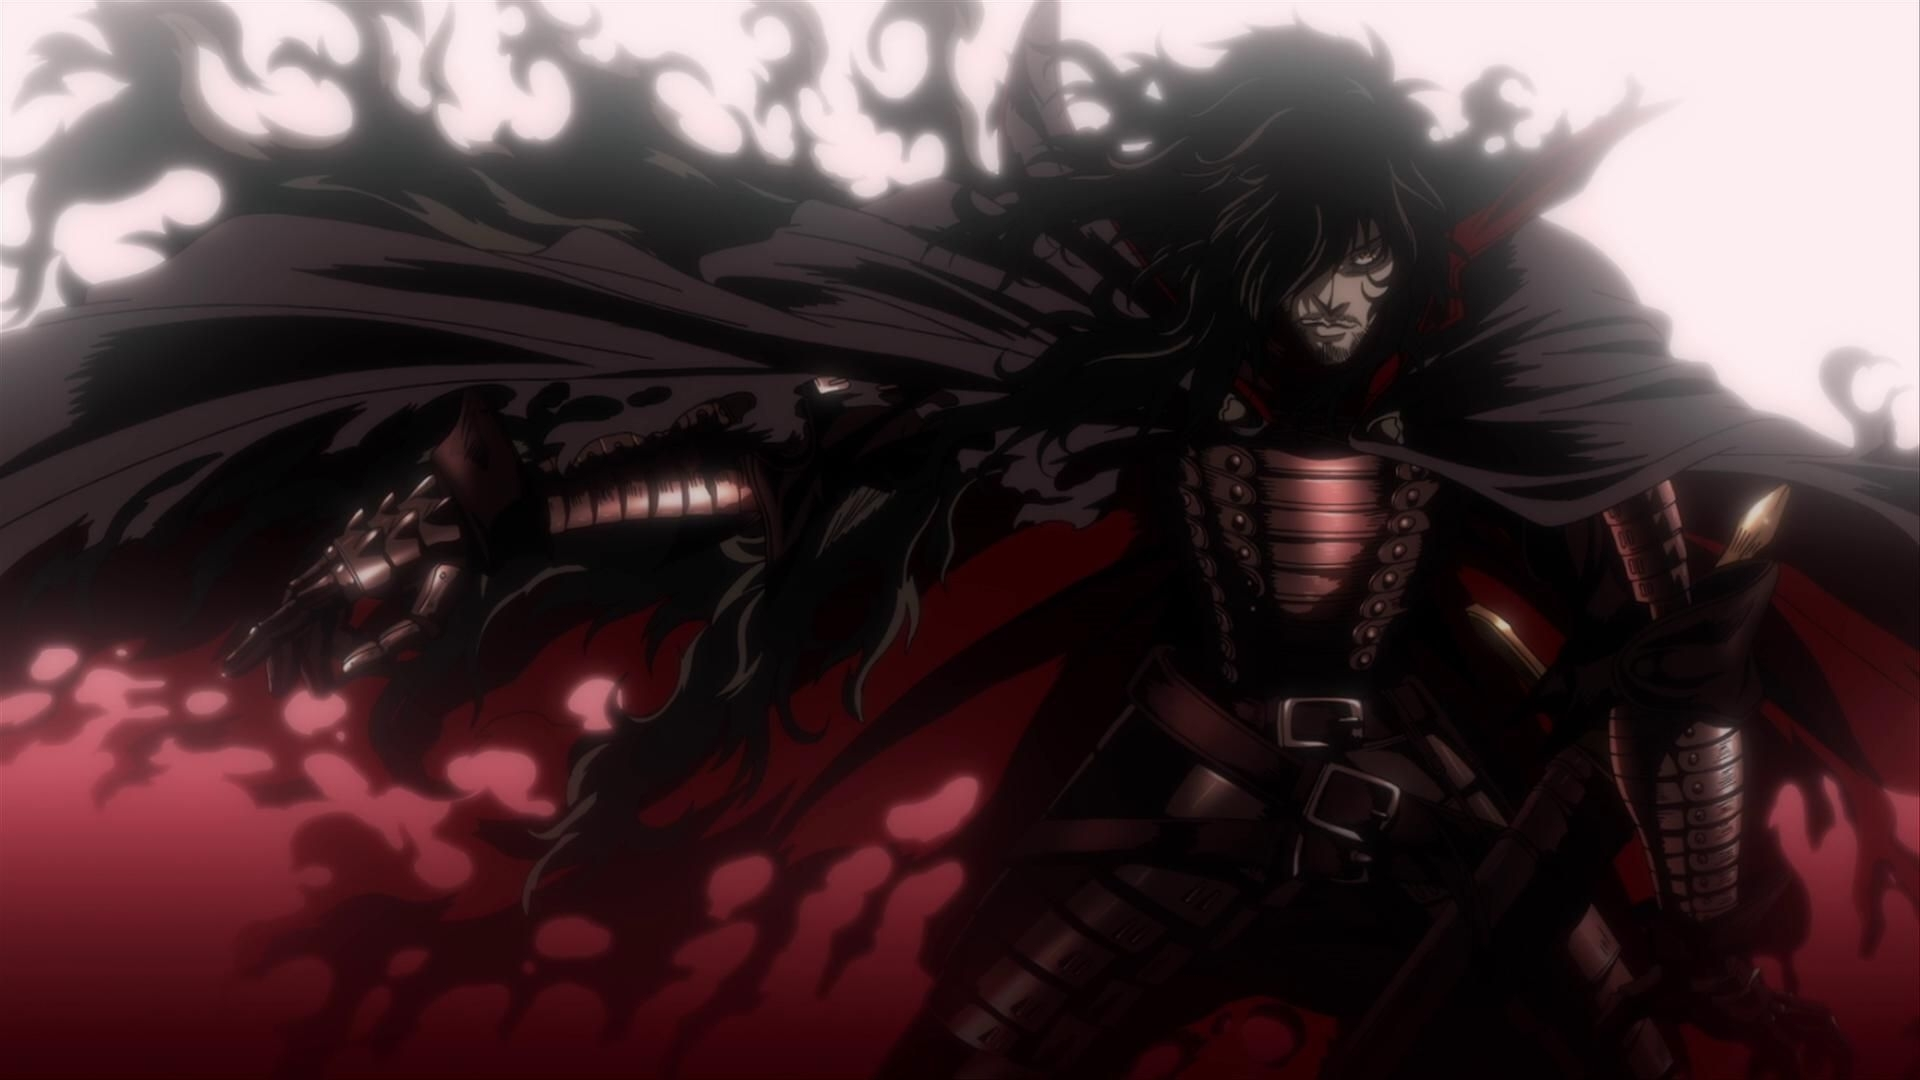 alucard vampire hellsing ultimate wallpaper - free download